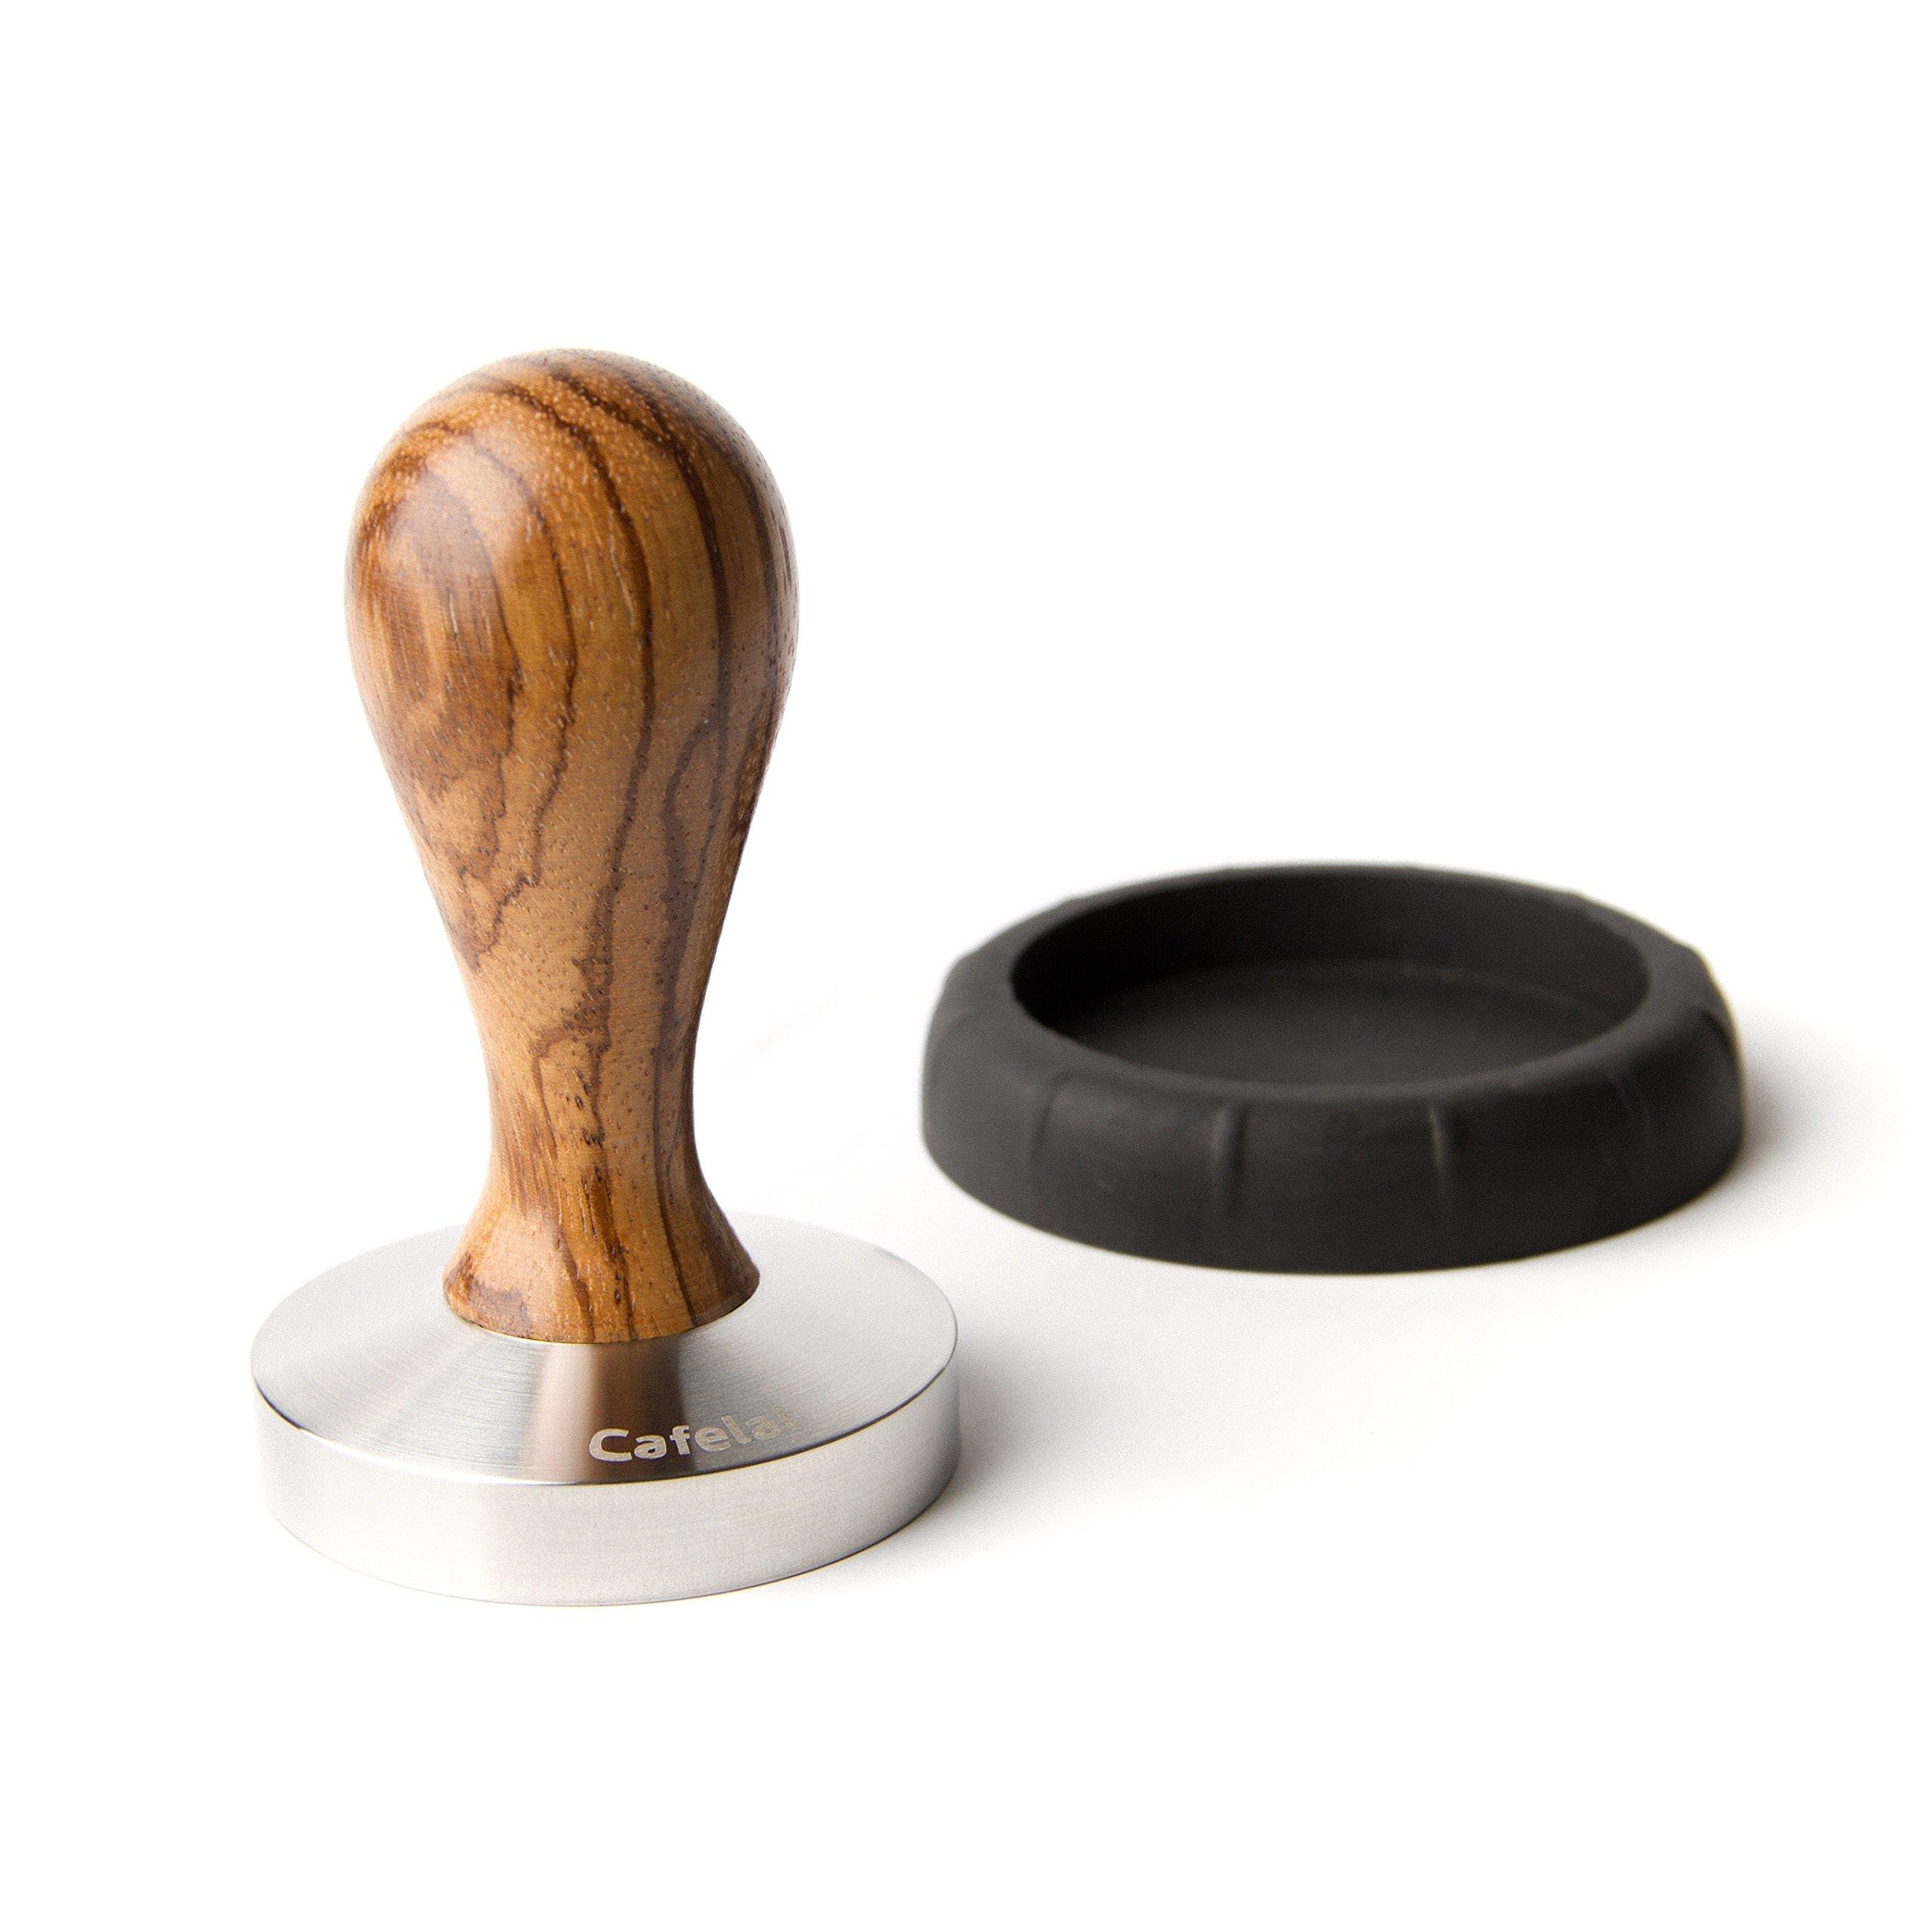 Cafelat Drop Espresso Tamper - 58mm Flat / Zebra Wood by Cafelat